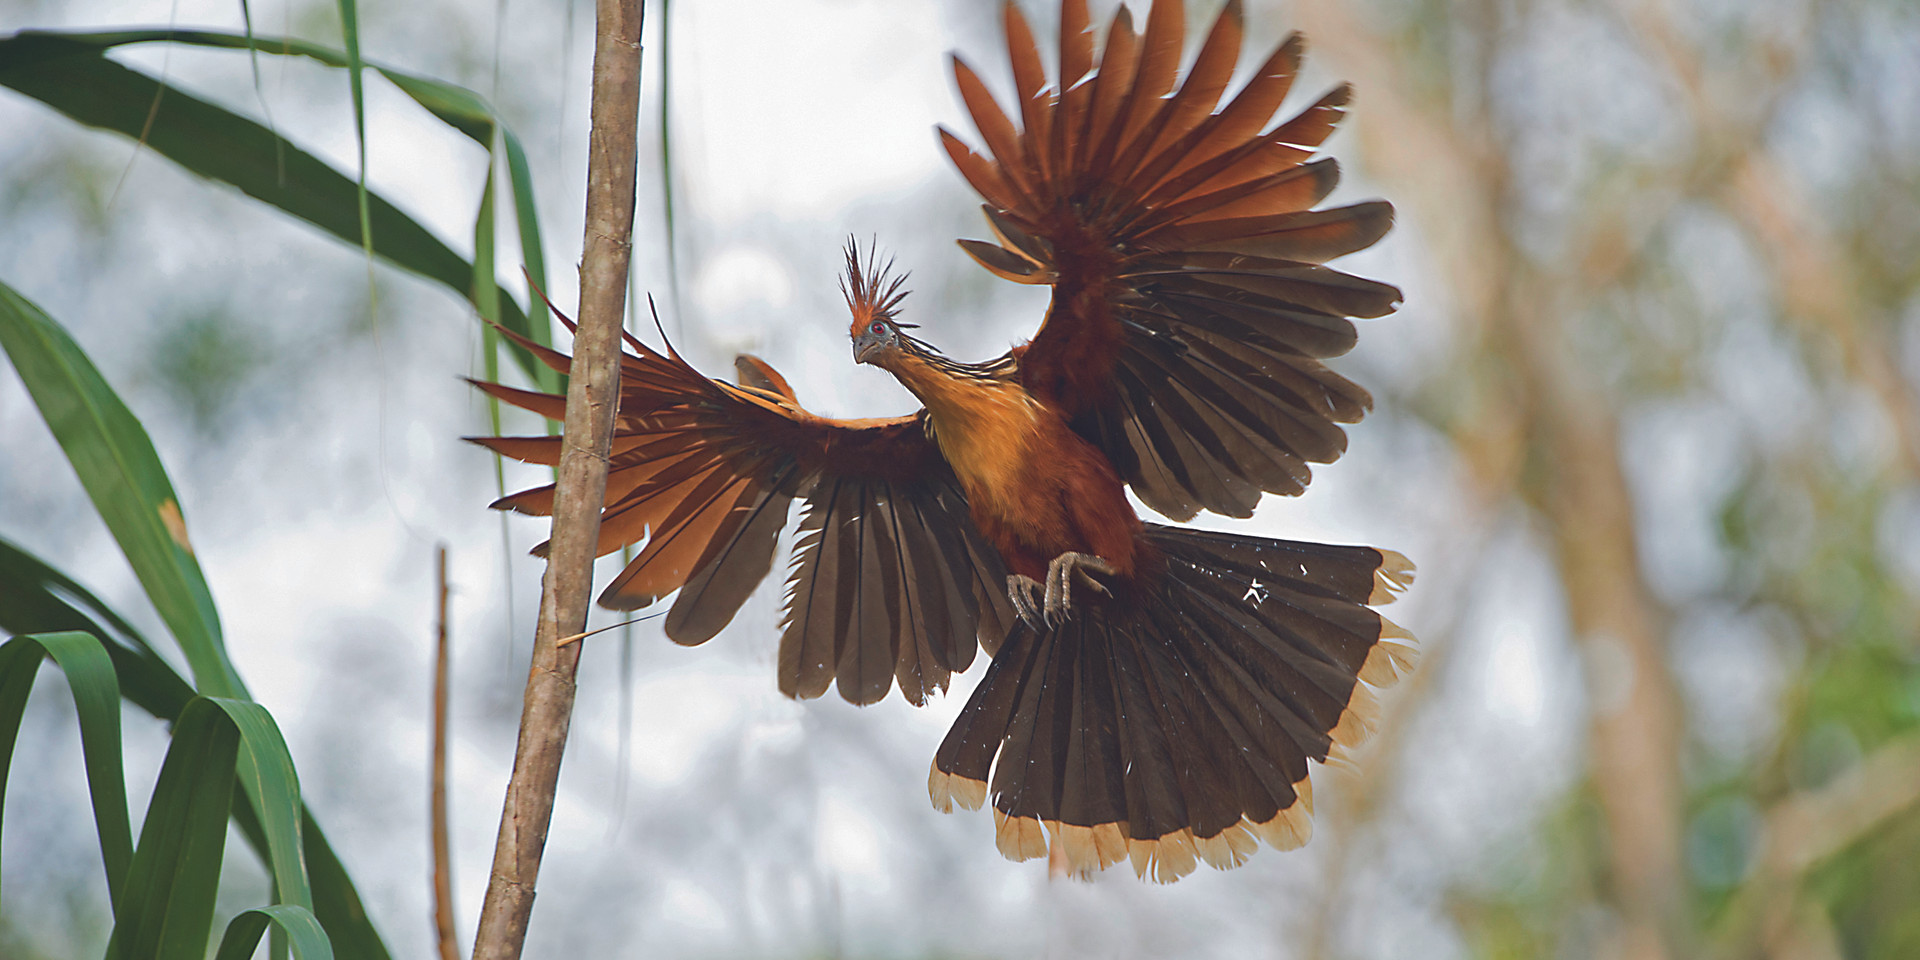 hoatzin - by ericson pinedo.jpg